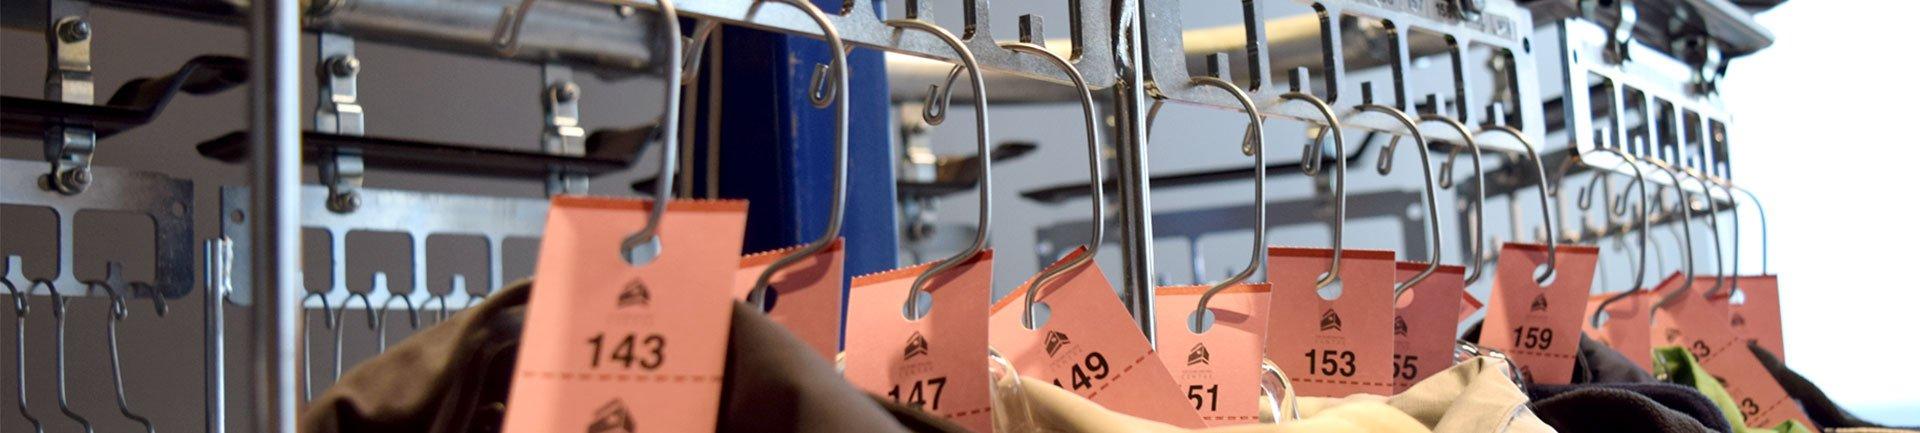 Storage and retrieval conveyor system for coat check